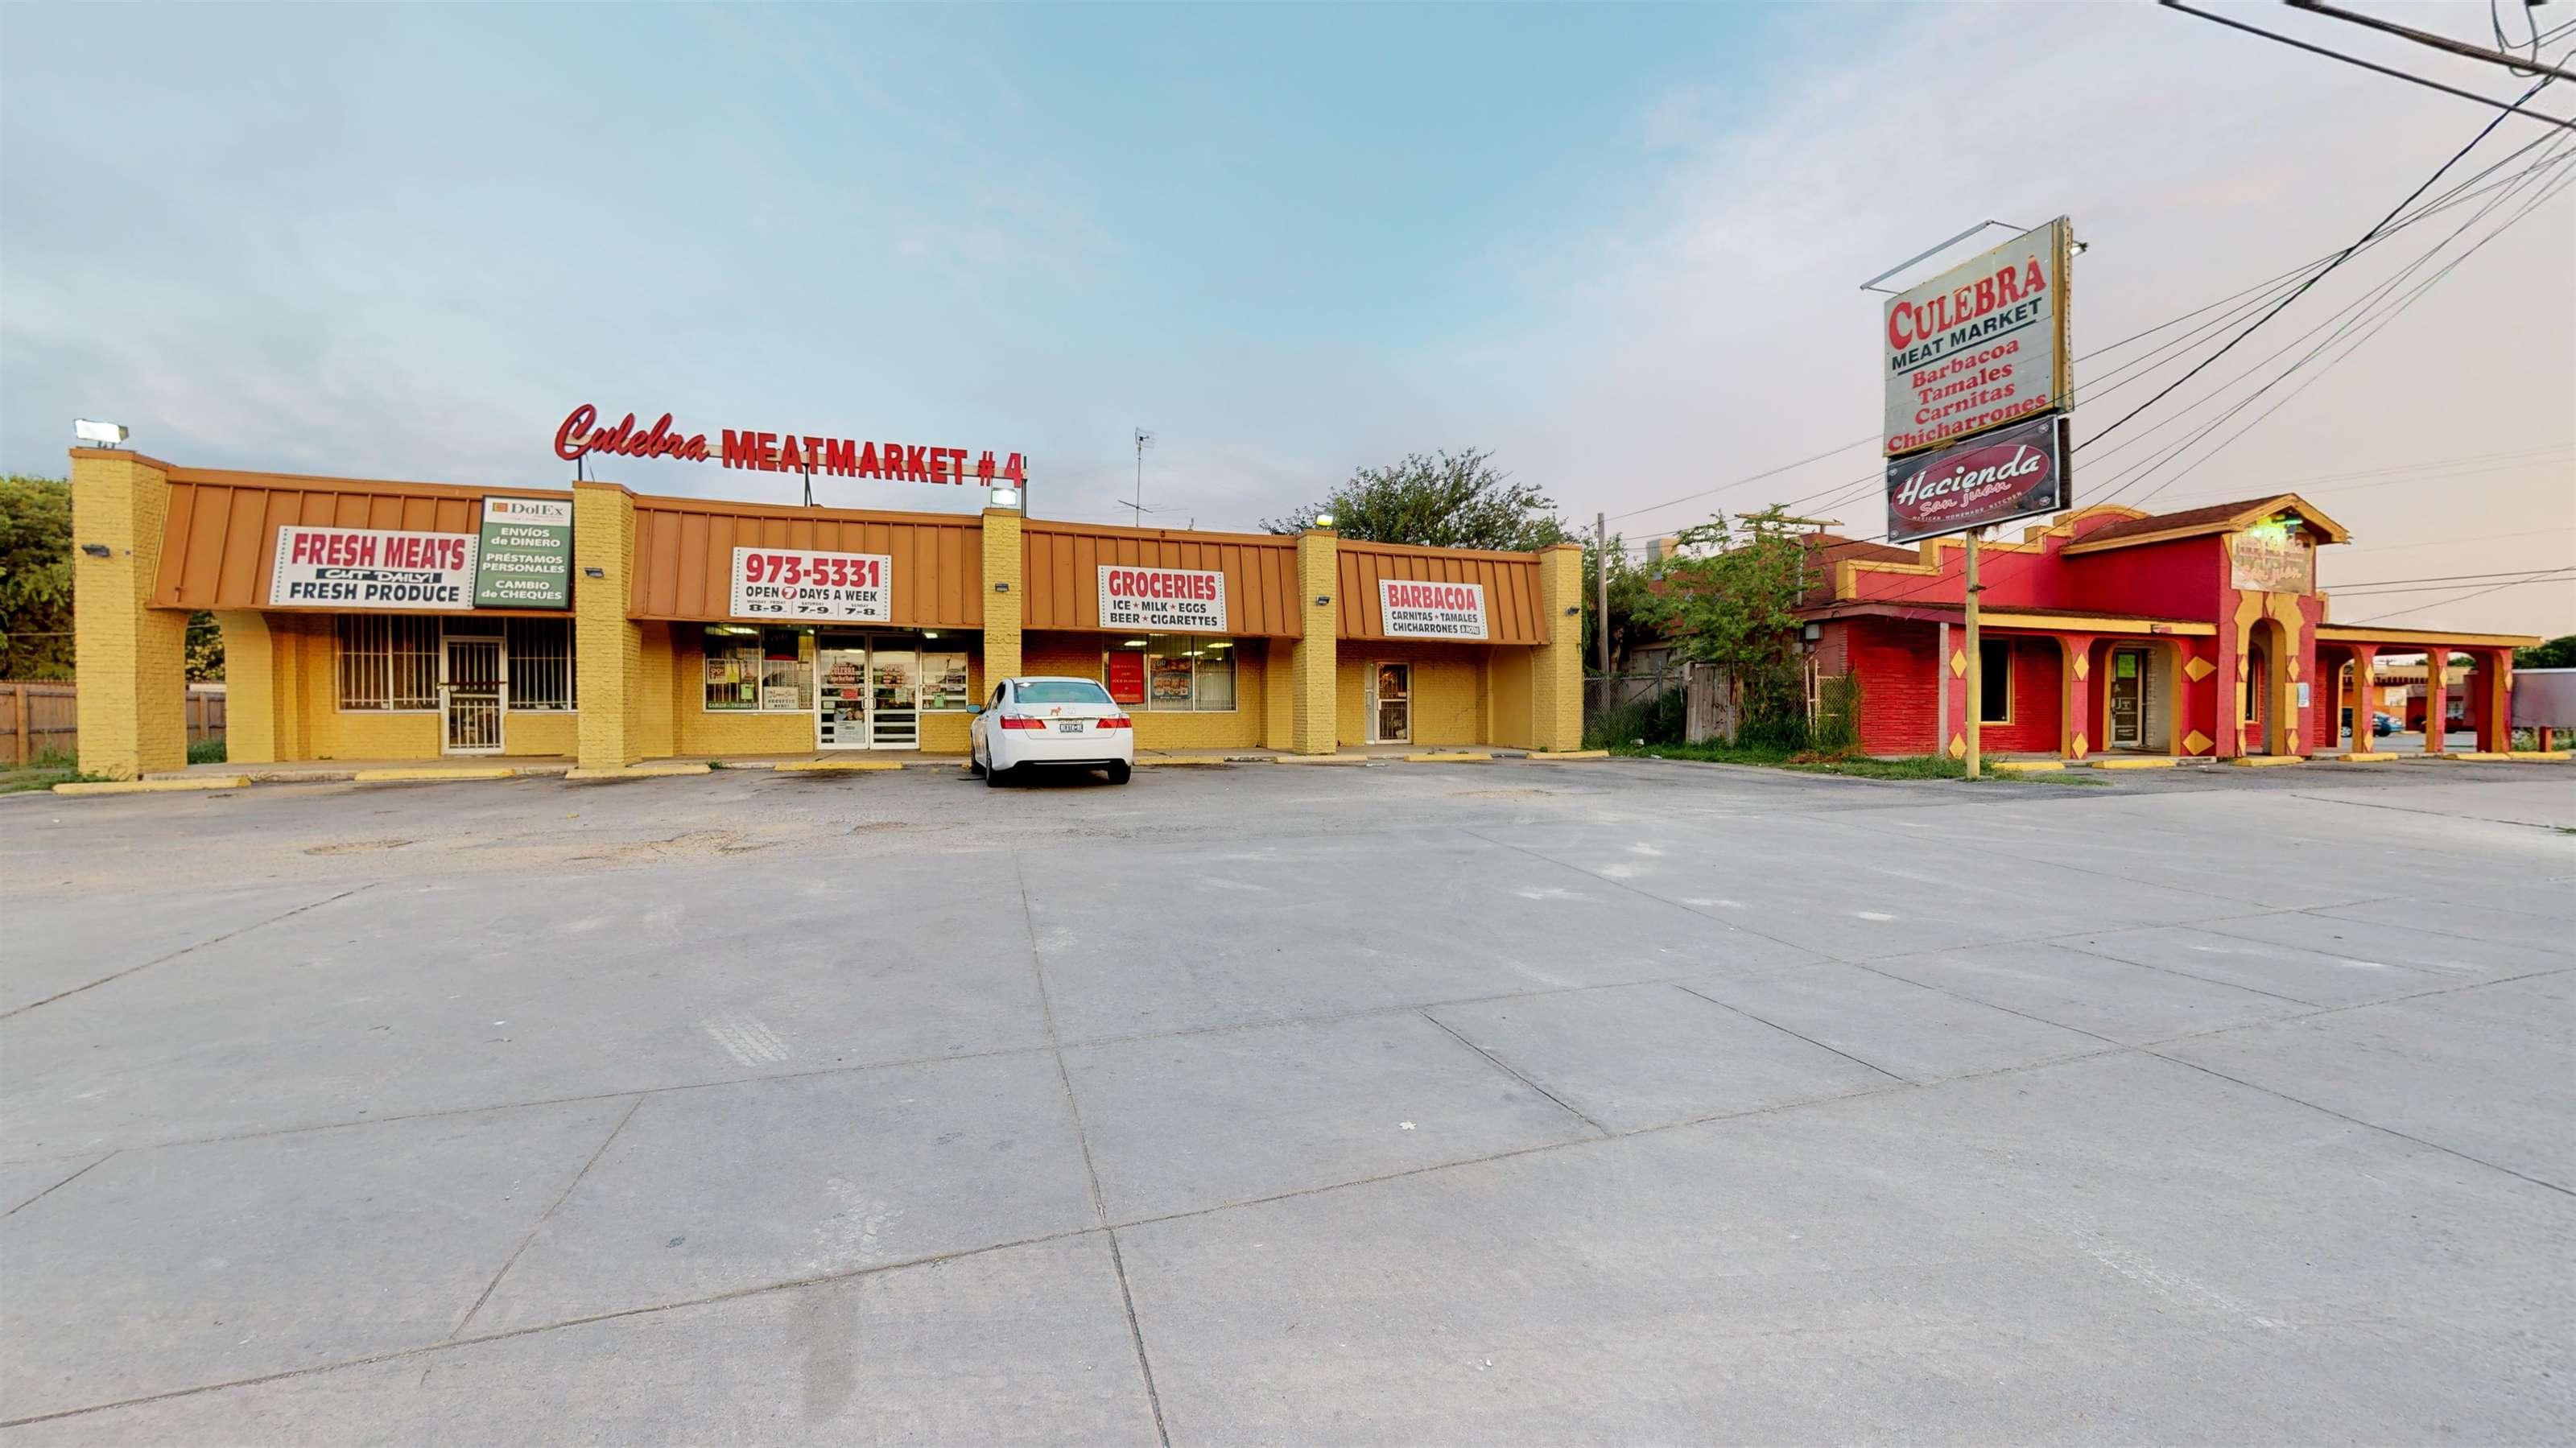 2407 Pinn Rd, #100, San Antonio, TX 78227